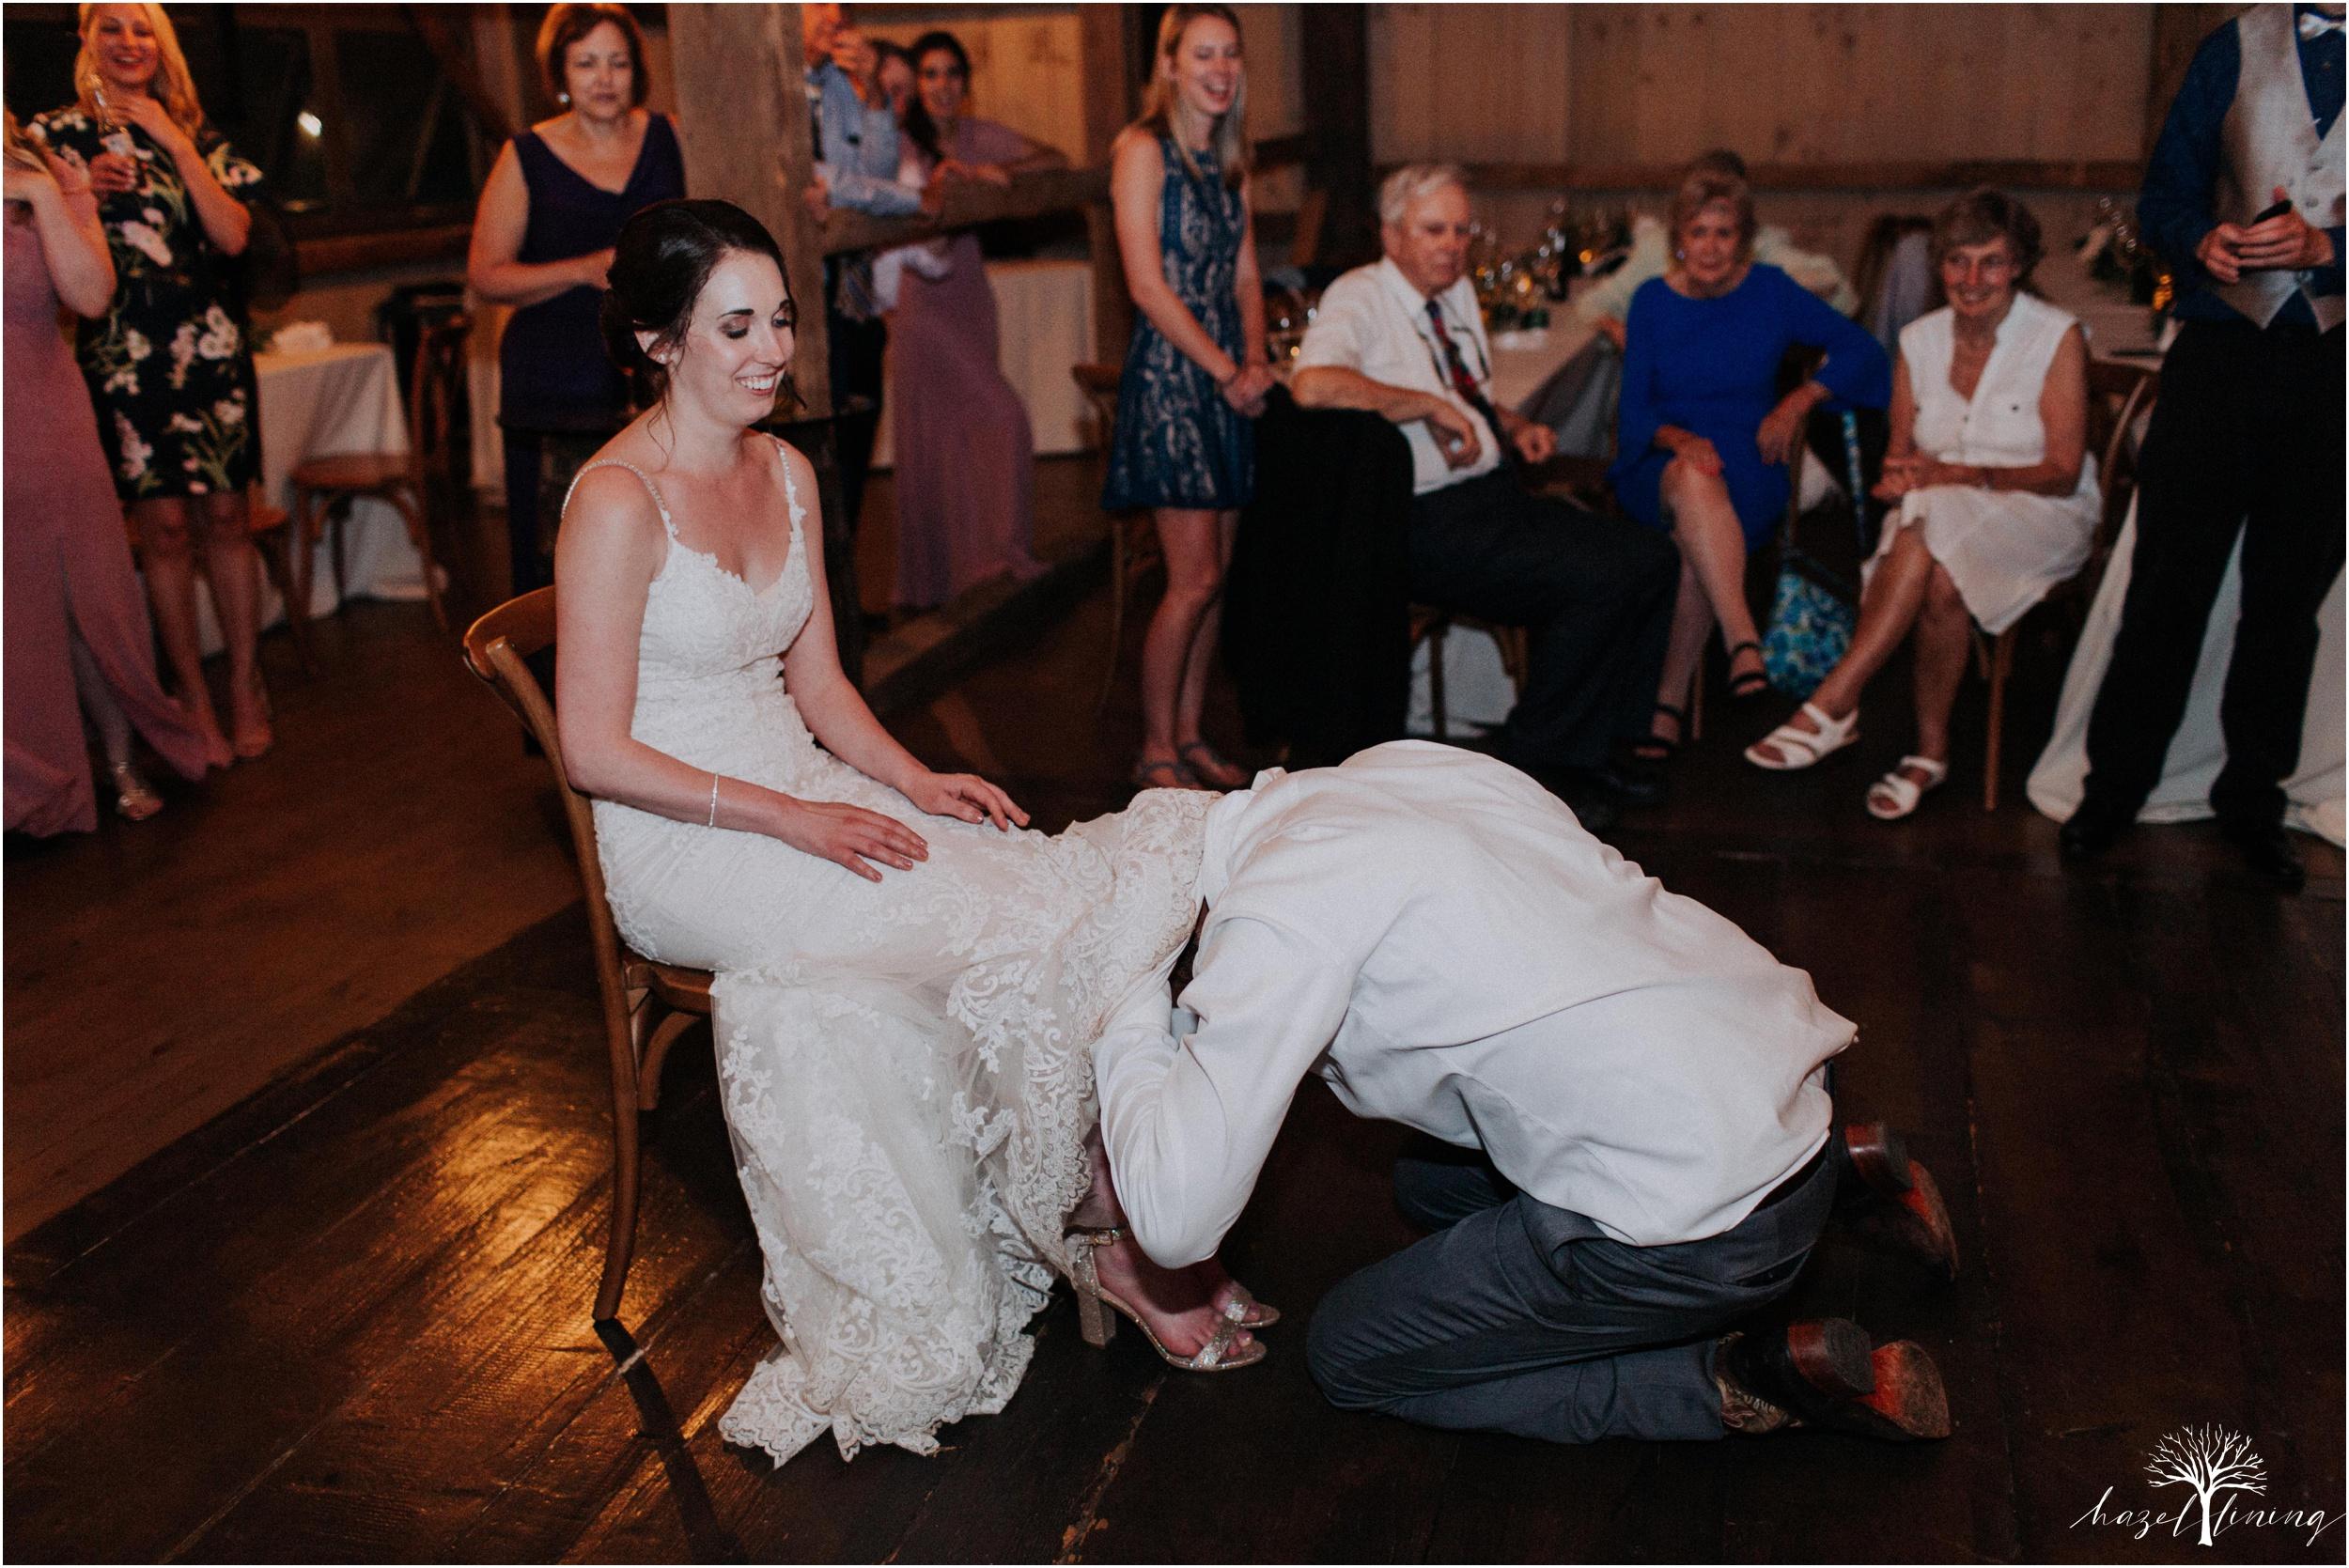 hazel-lining-travel-wedding-elopement-photography-lisa-landon-shoemaker-the-farm-bakery-and-events-bucks-county-quakertown-pennsylvania-summer-country-outdoor-farm-wedding_0166.jpg